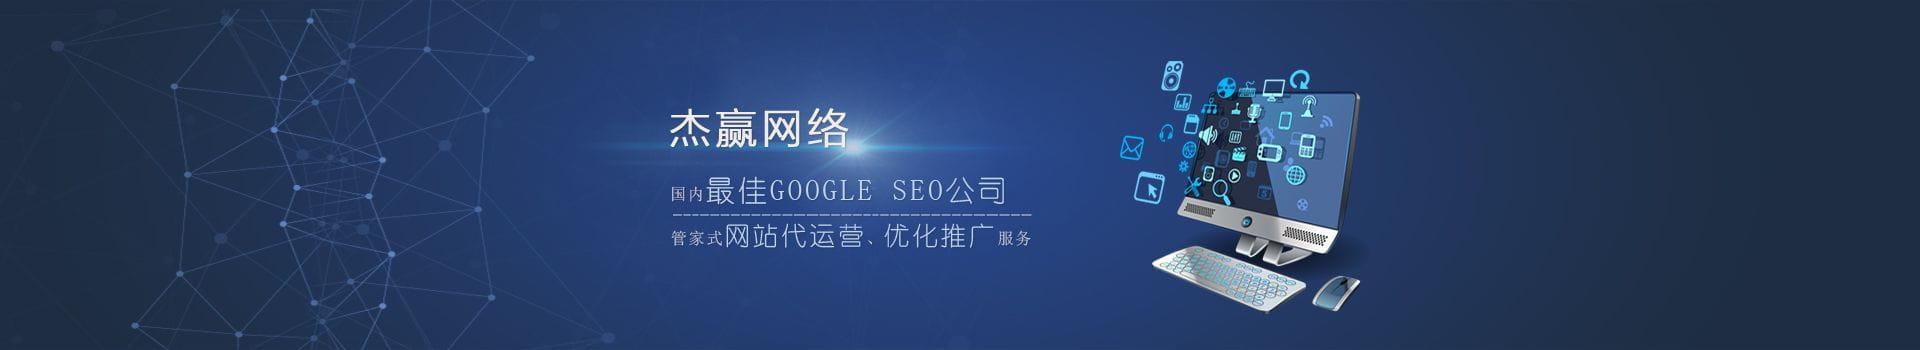 Google SEO 公司